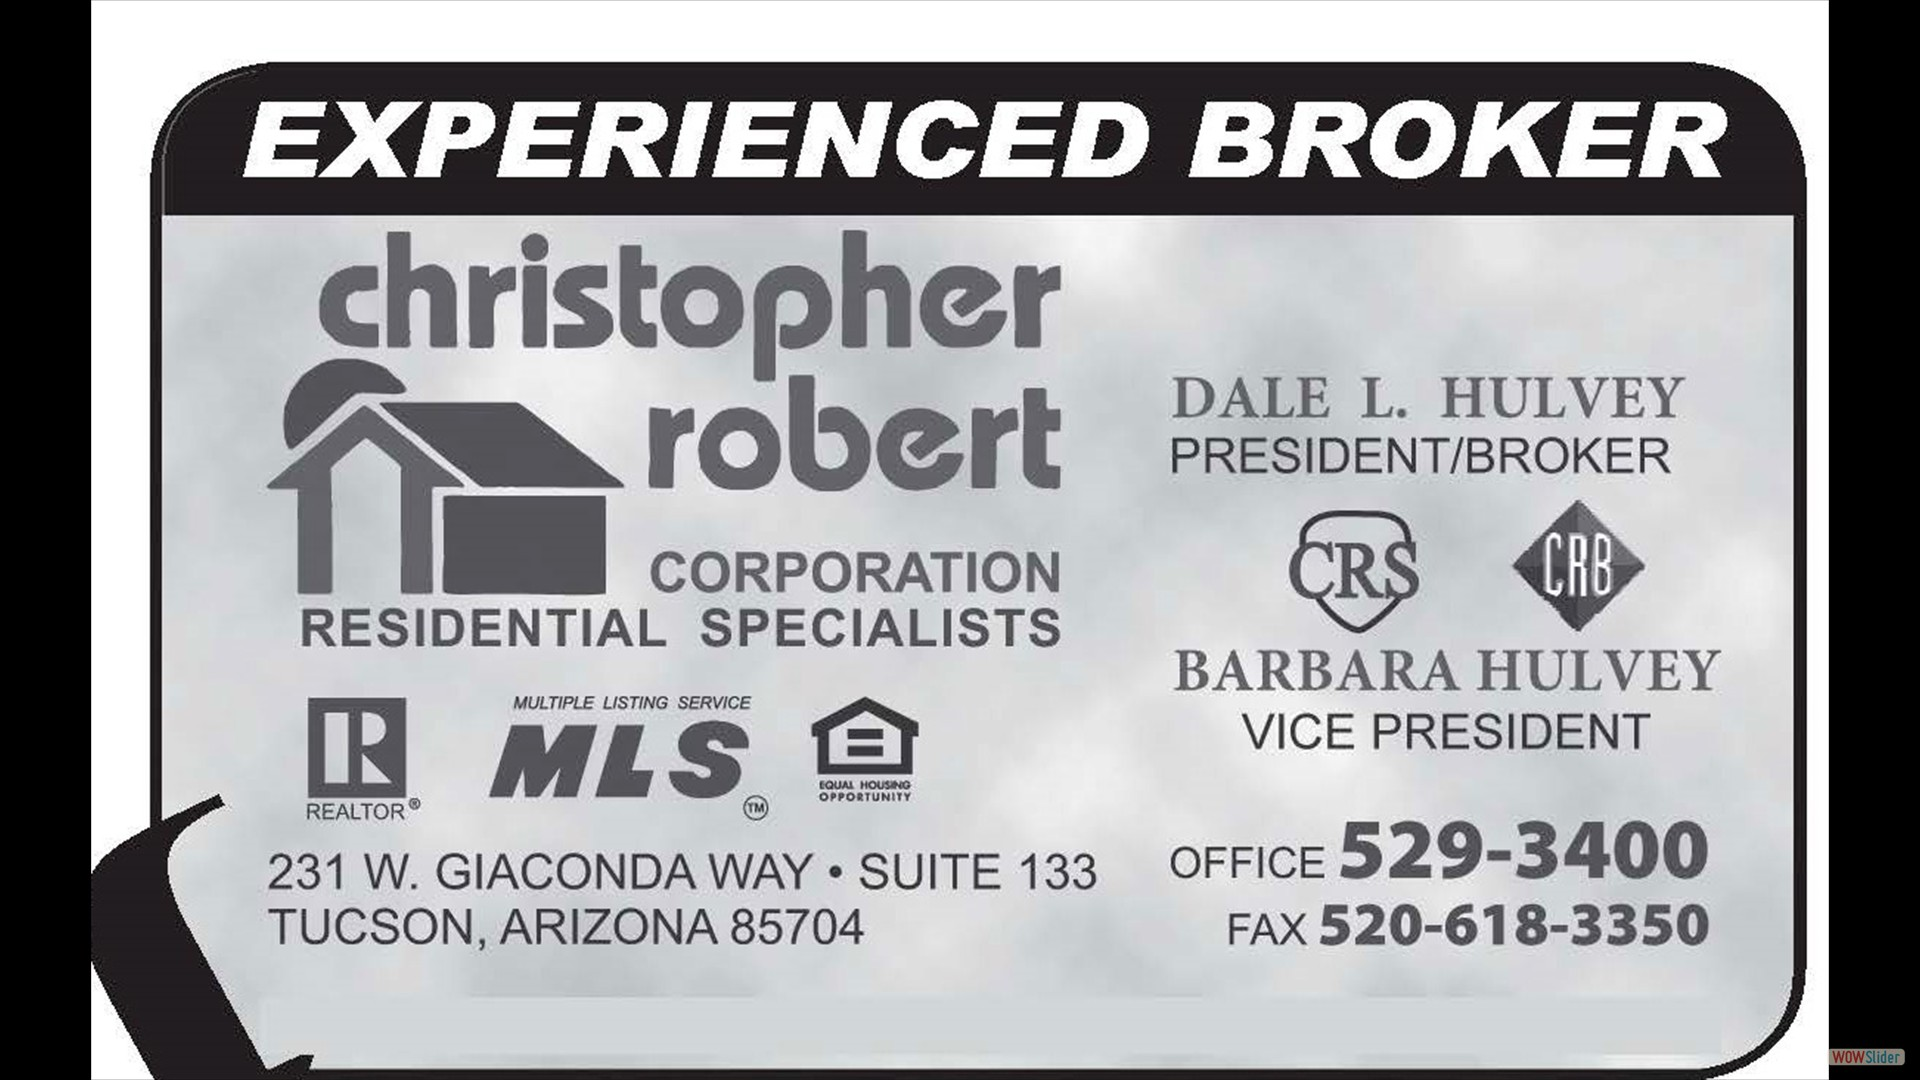 Experienced Broker